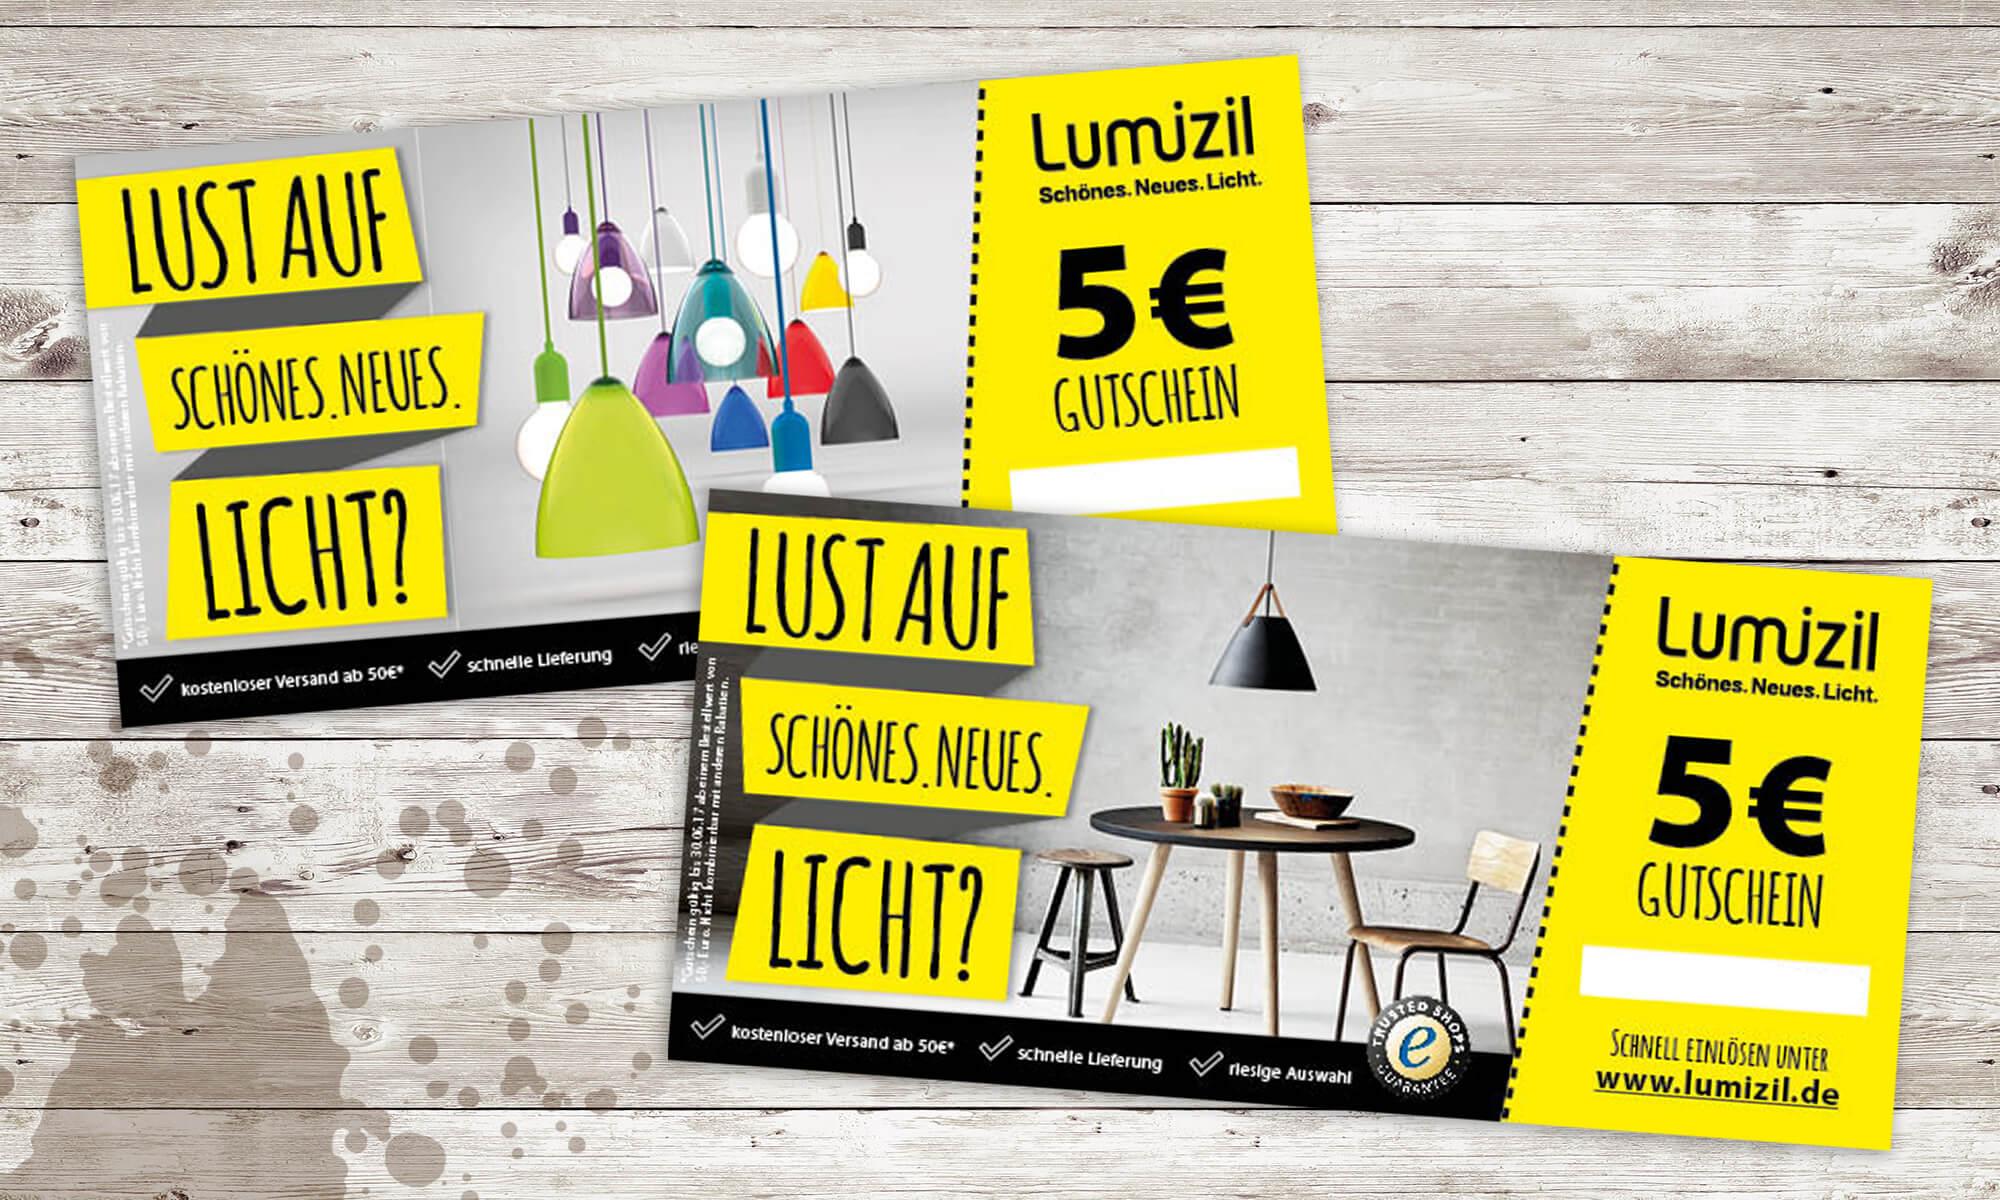 Lumizil - Paketbeileger